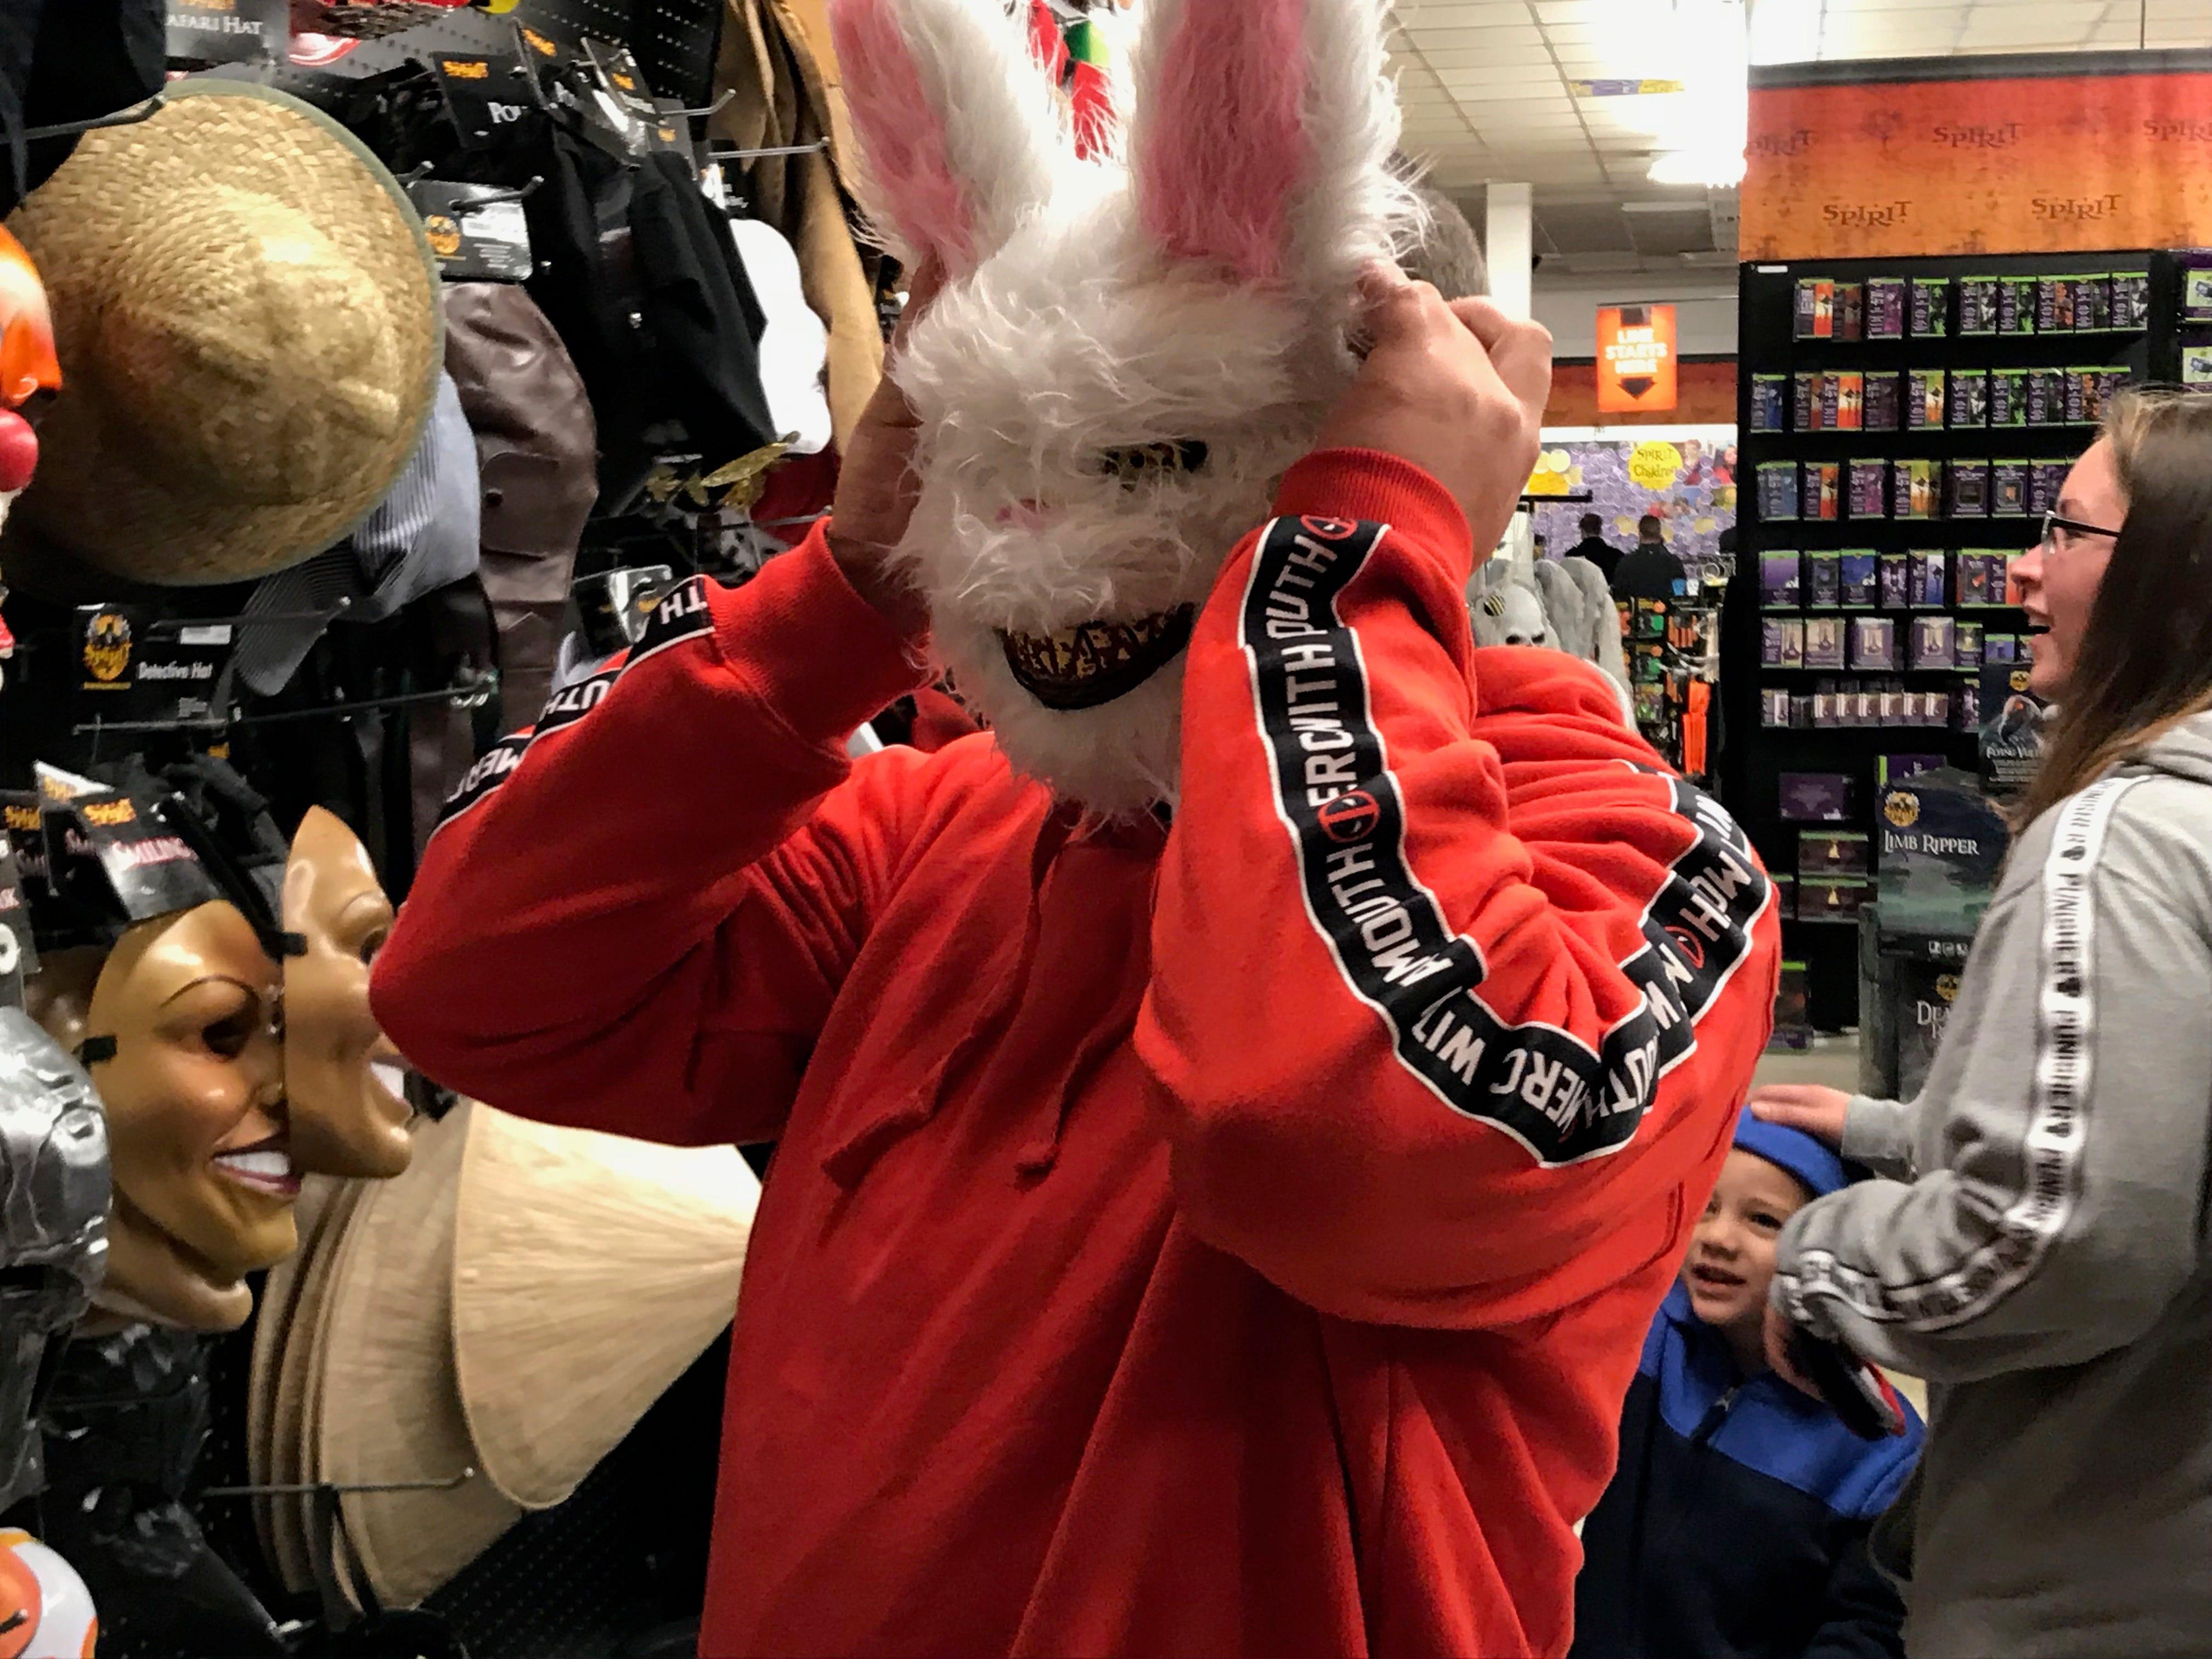 Fortnite Pickaxe Spirit Halloween Fortnite Slashers Lead The Way In Costume Ideas